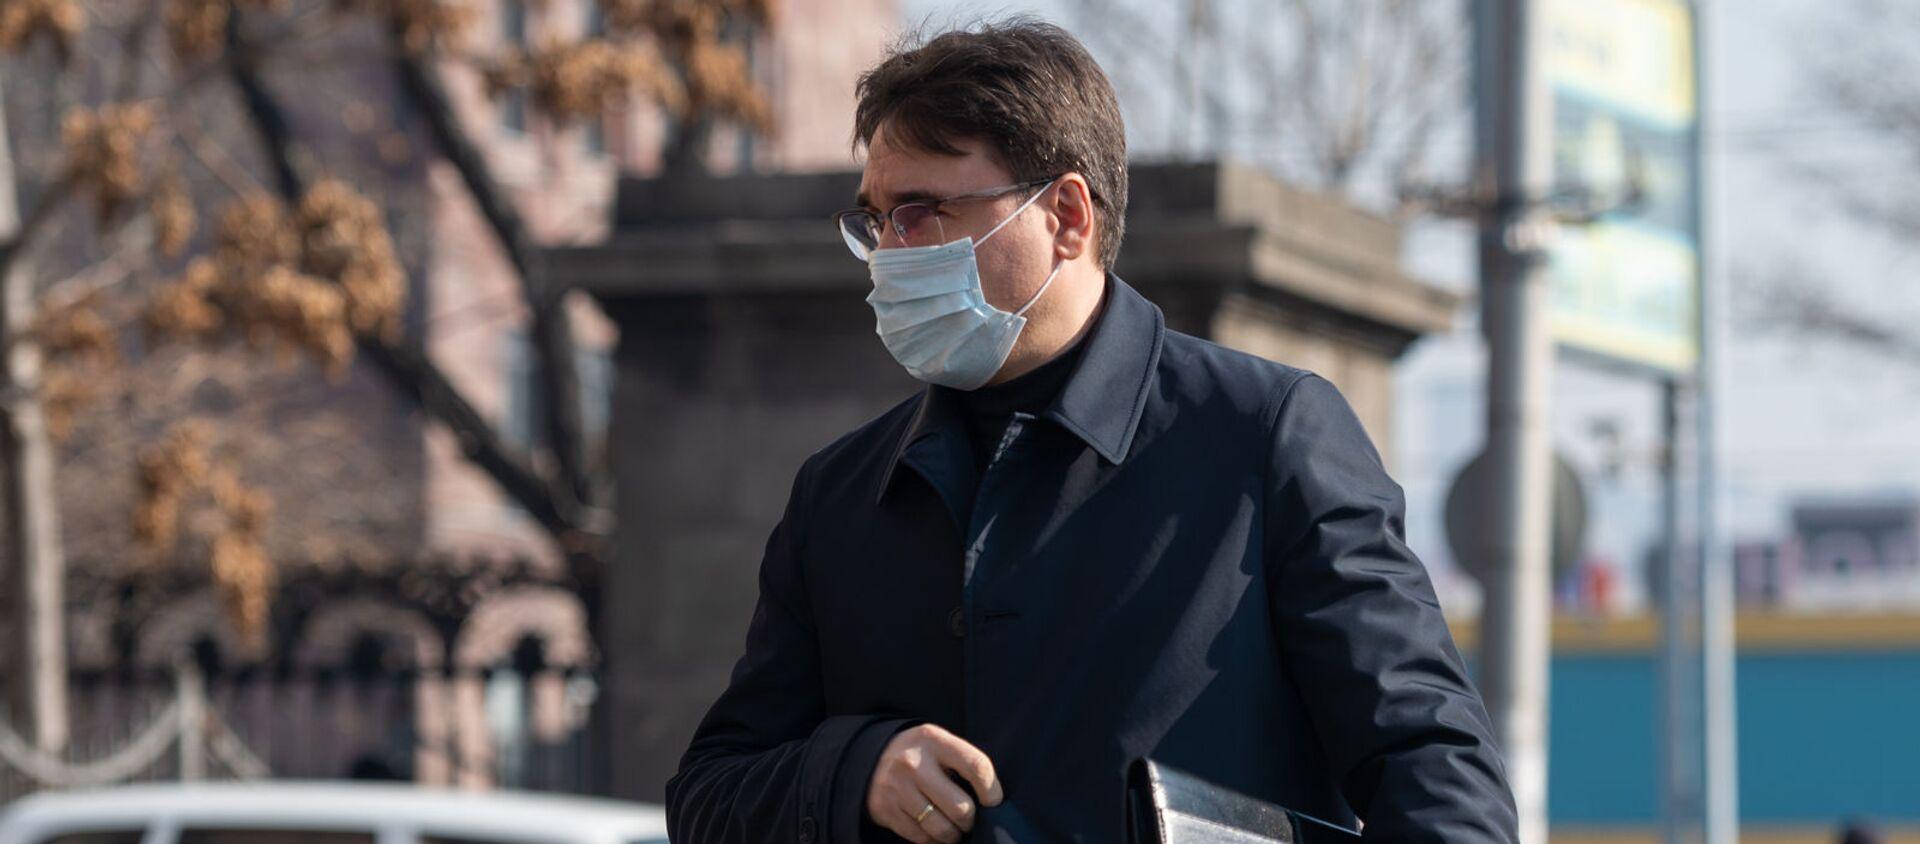 Бывший вице-премьер Армен Геворкян у здания Шенгавитского суда (2 февраля 2021). Еревaн - Sputnik Արմենիա, 1920, 23.02.2021